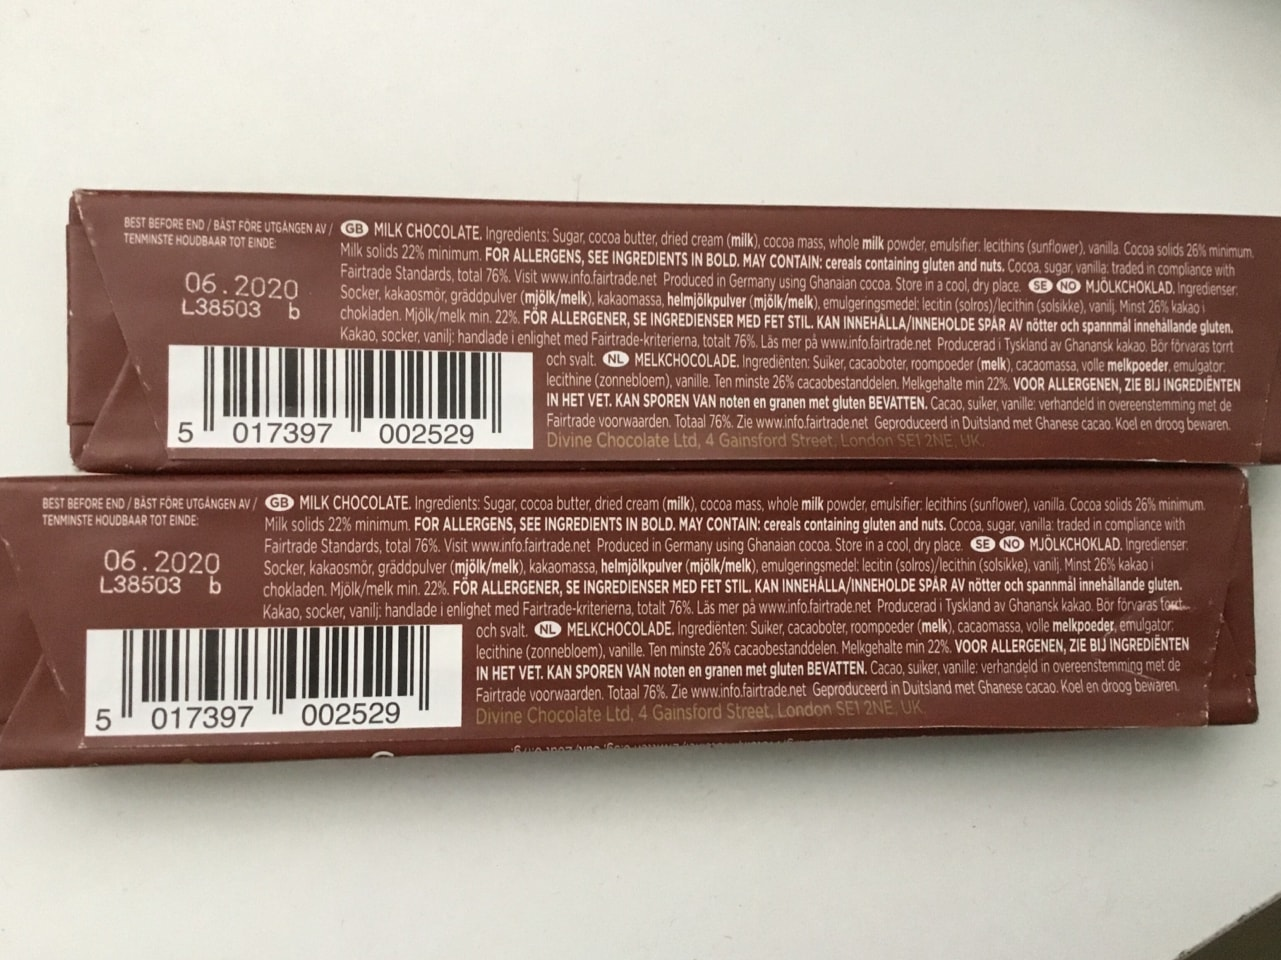 Divine Fairtrade Chocolate bars